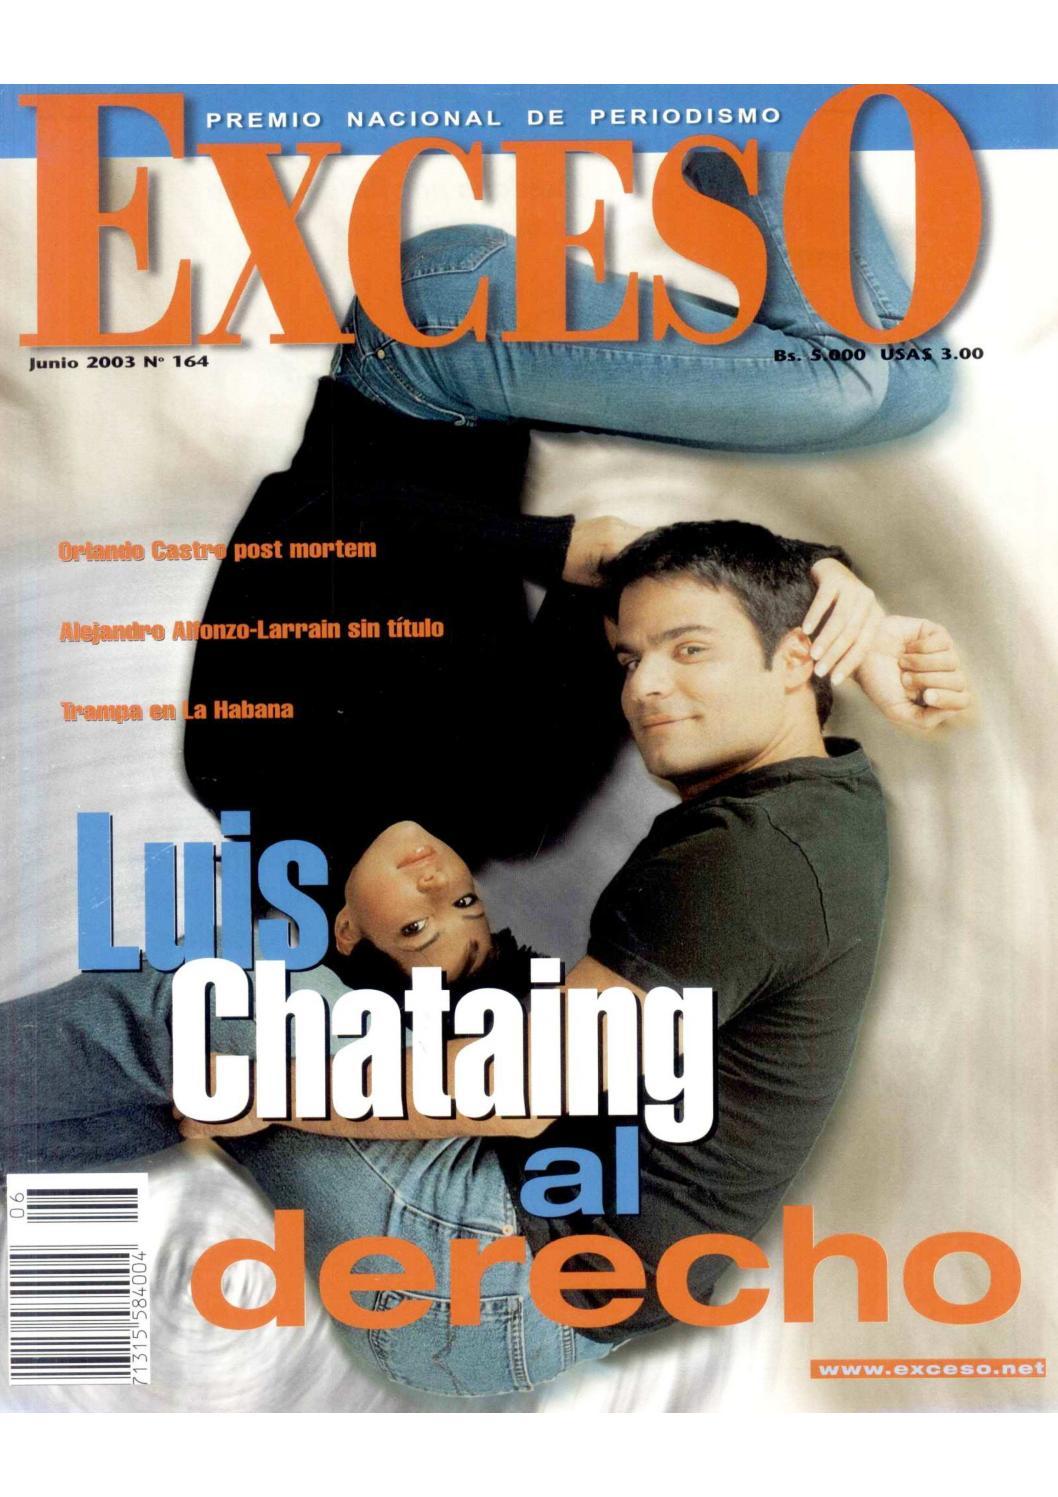 Revista Exceso edición nº 164 junio 2003 by Revista Exceso - 1988 a ...